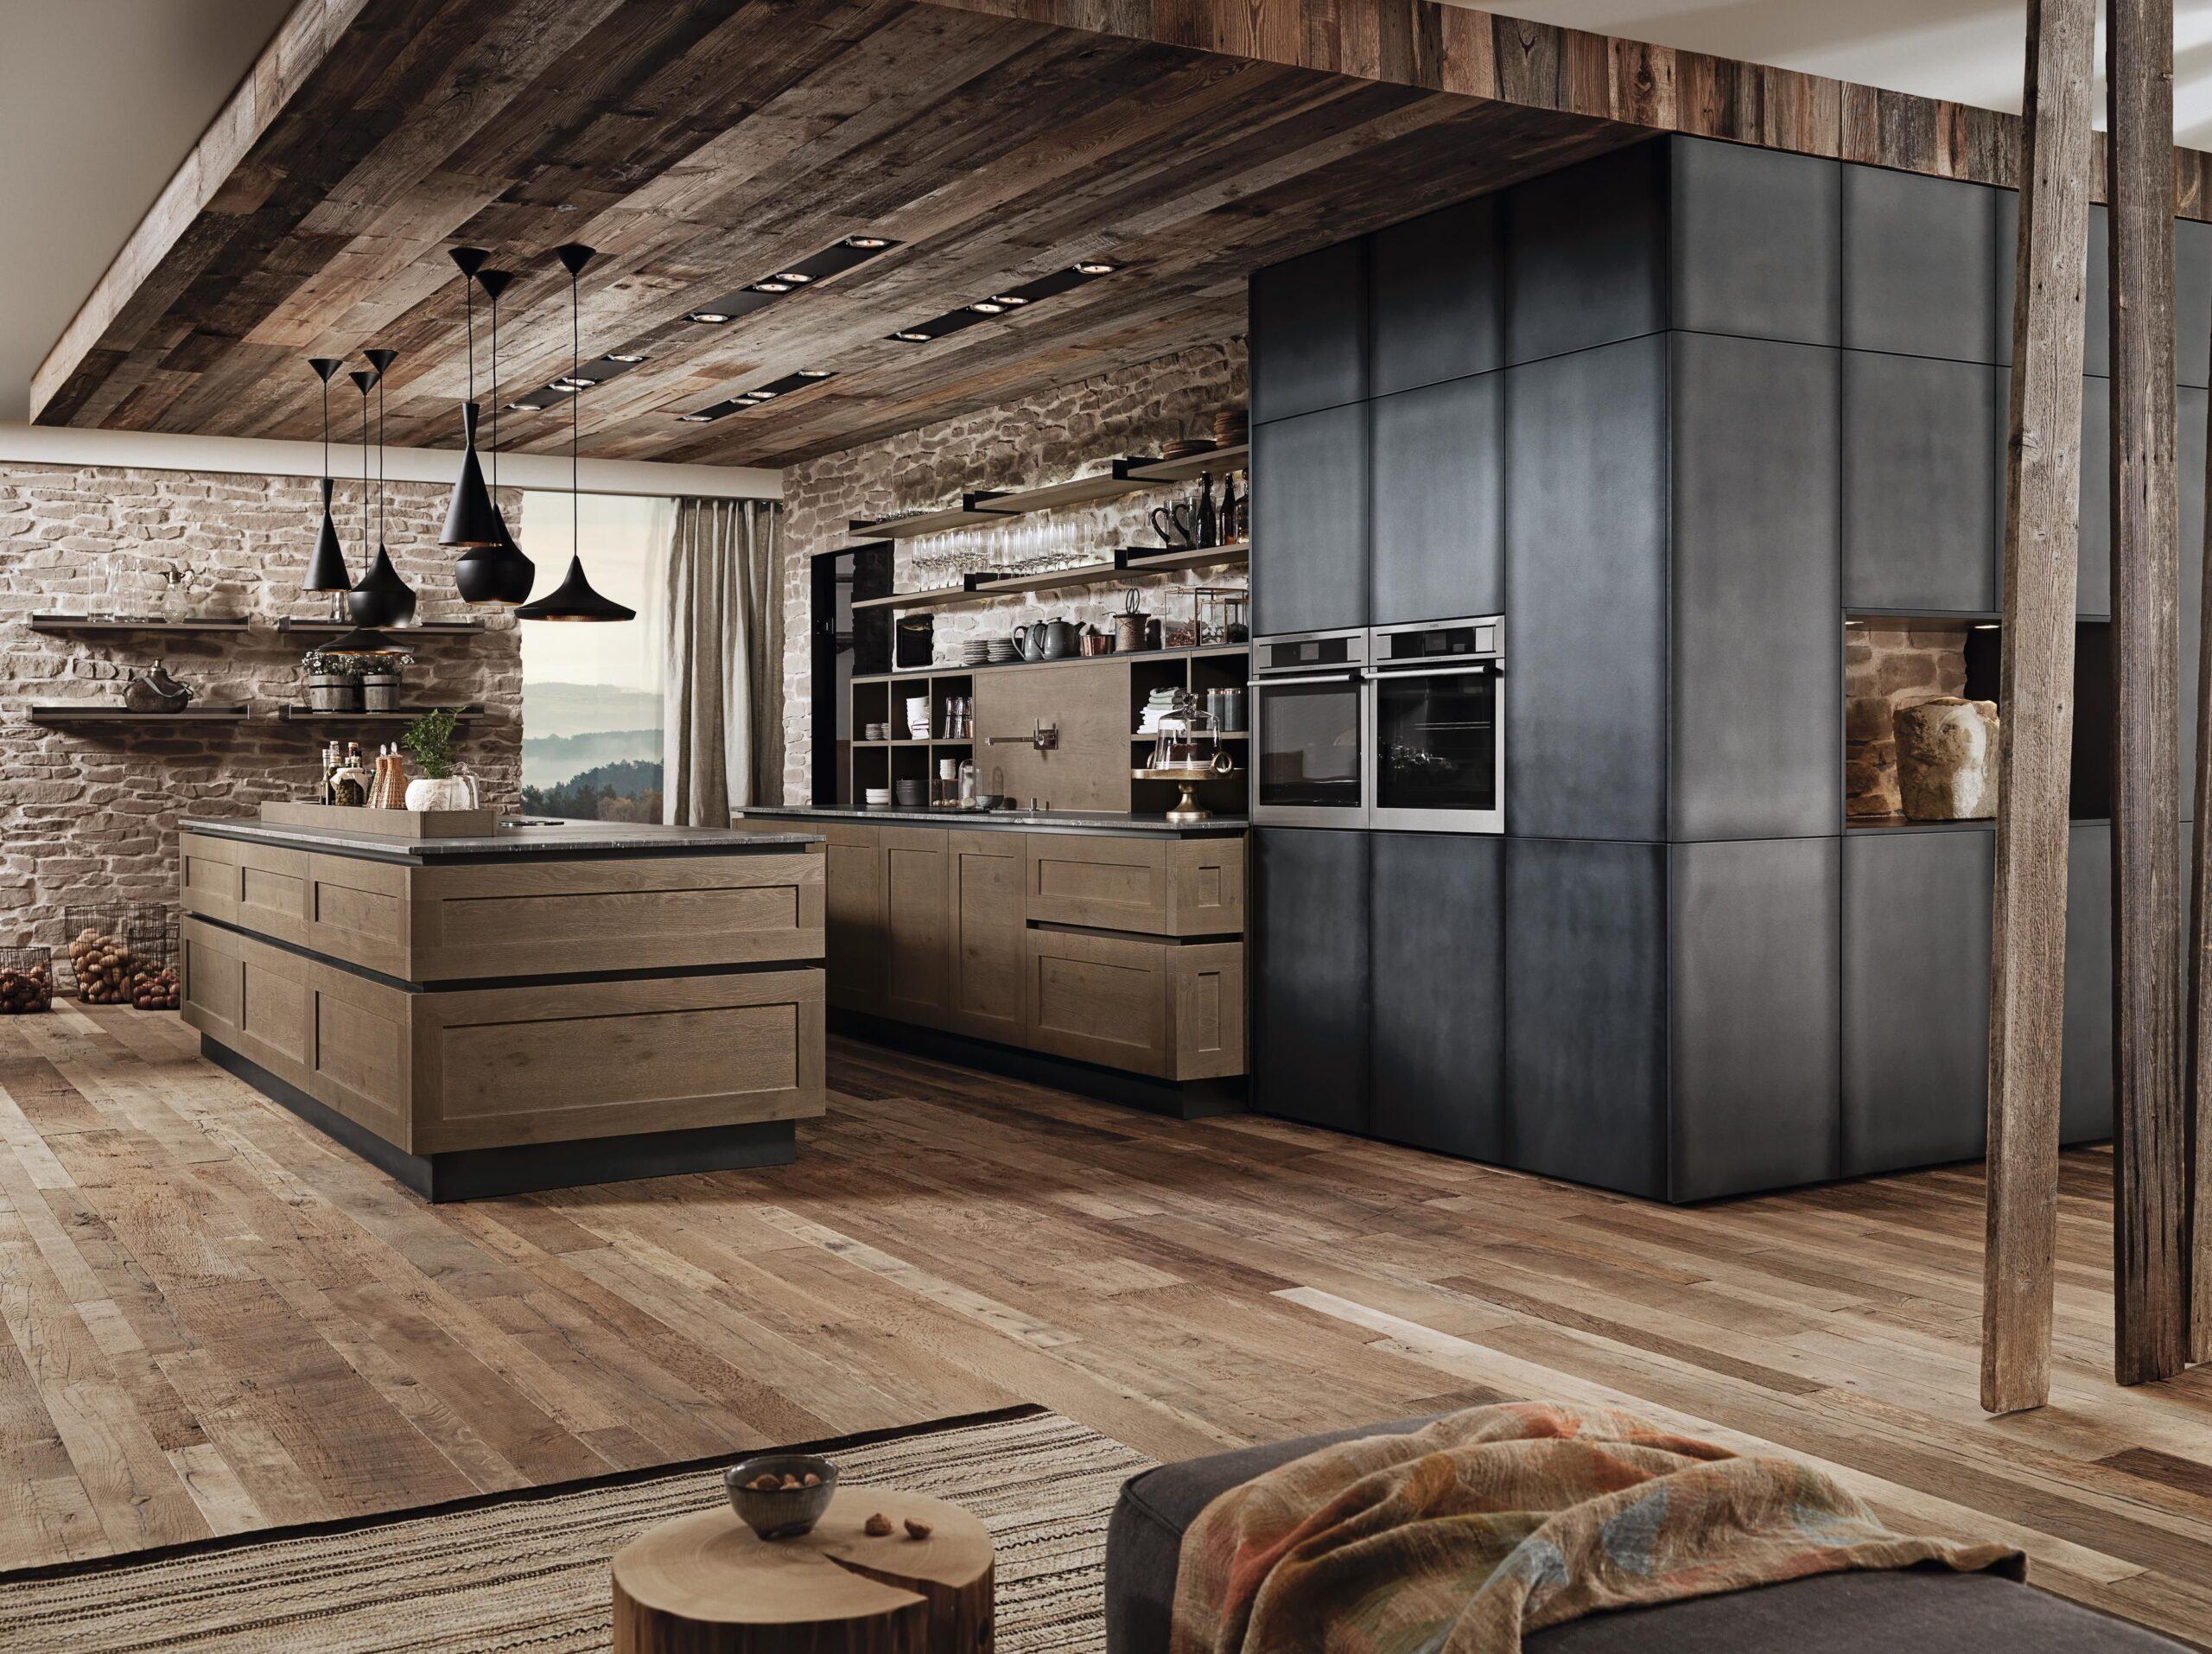 Full Size of Küchen Rustikal Regal Rustikaler Esstisch Küche Holz Rustikales Bett Wohnzimmer Küchen Rustikal